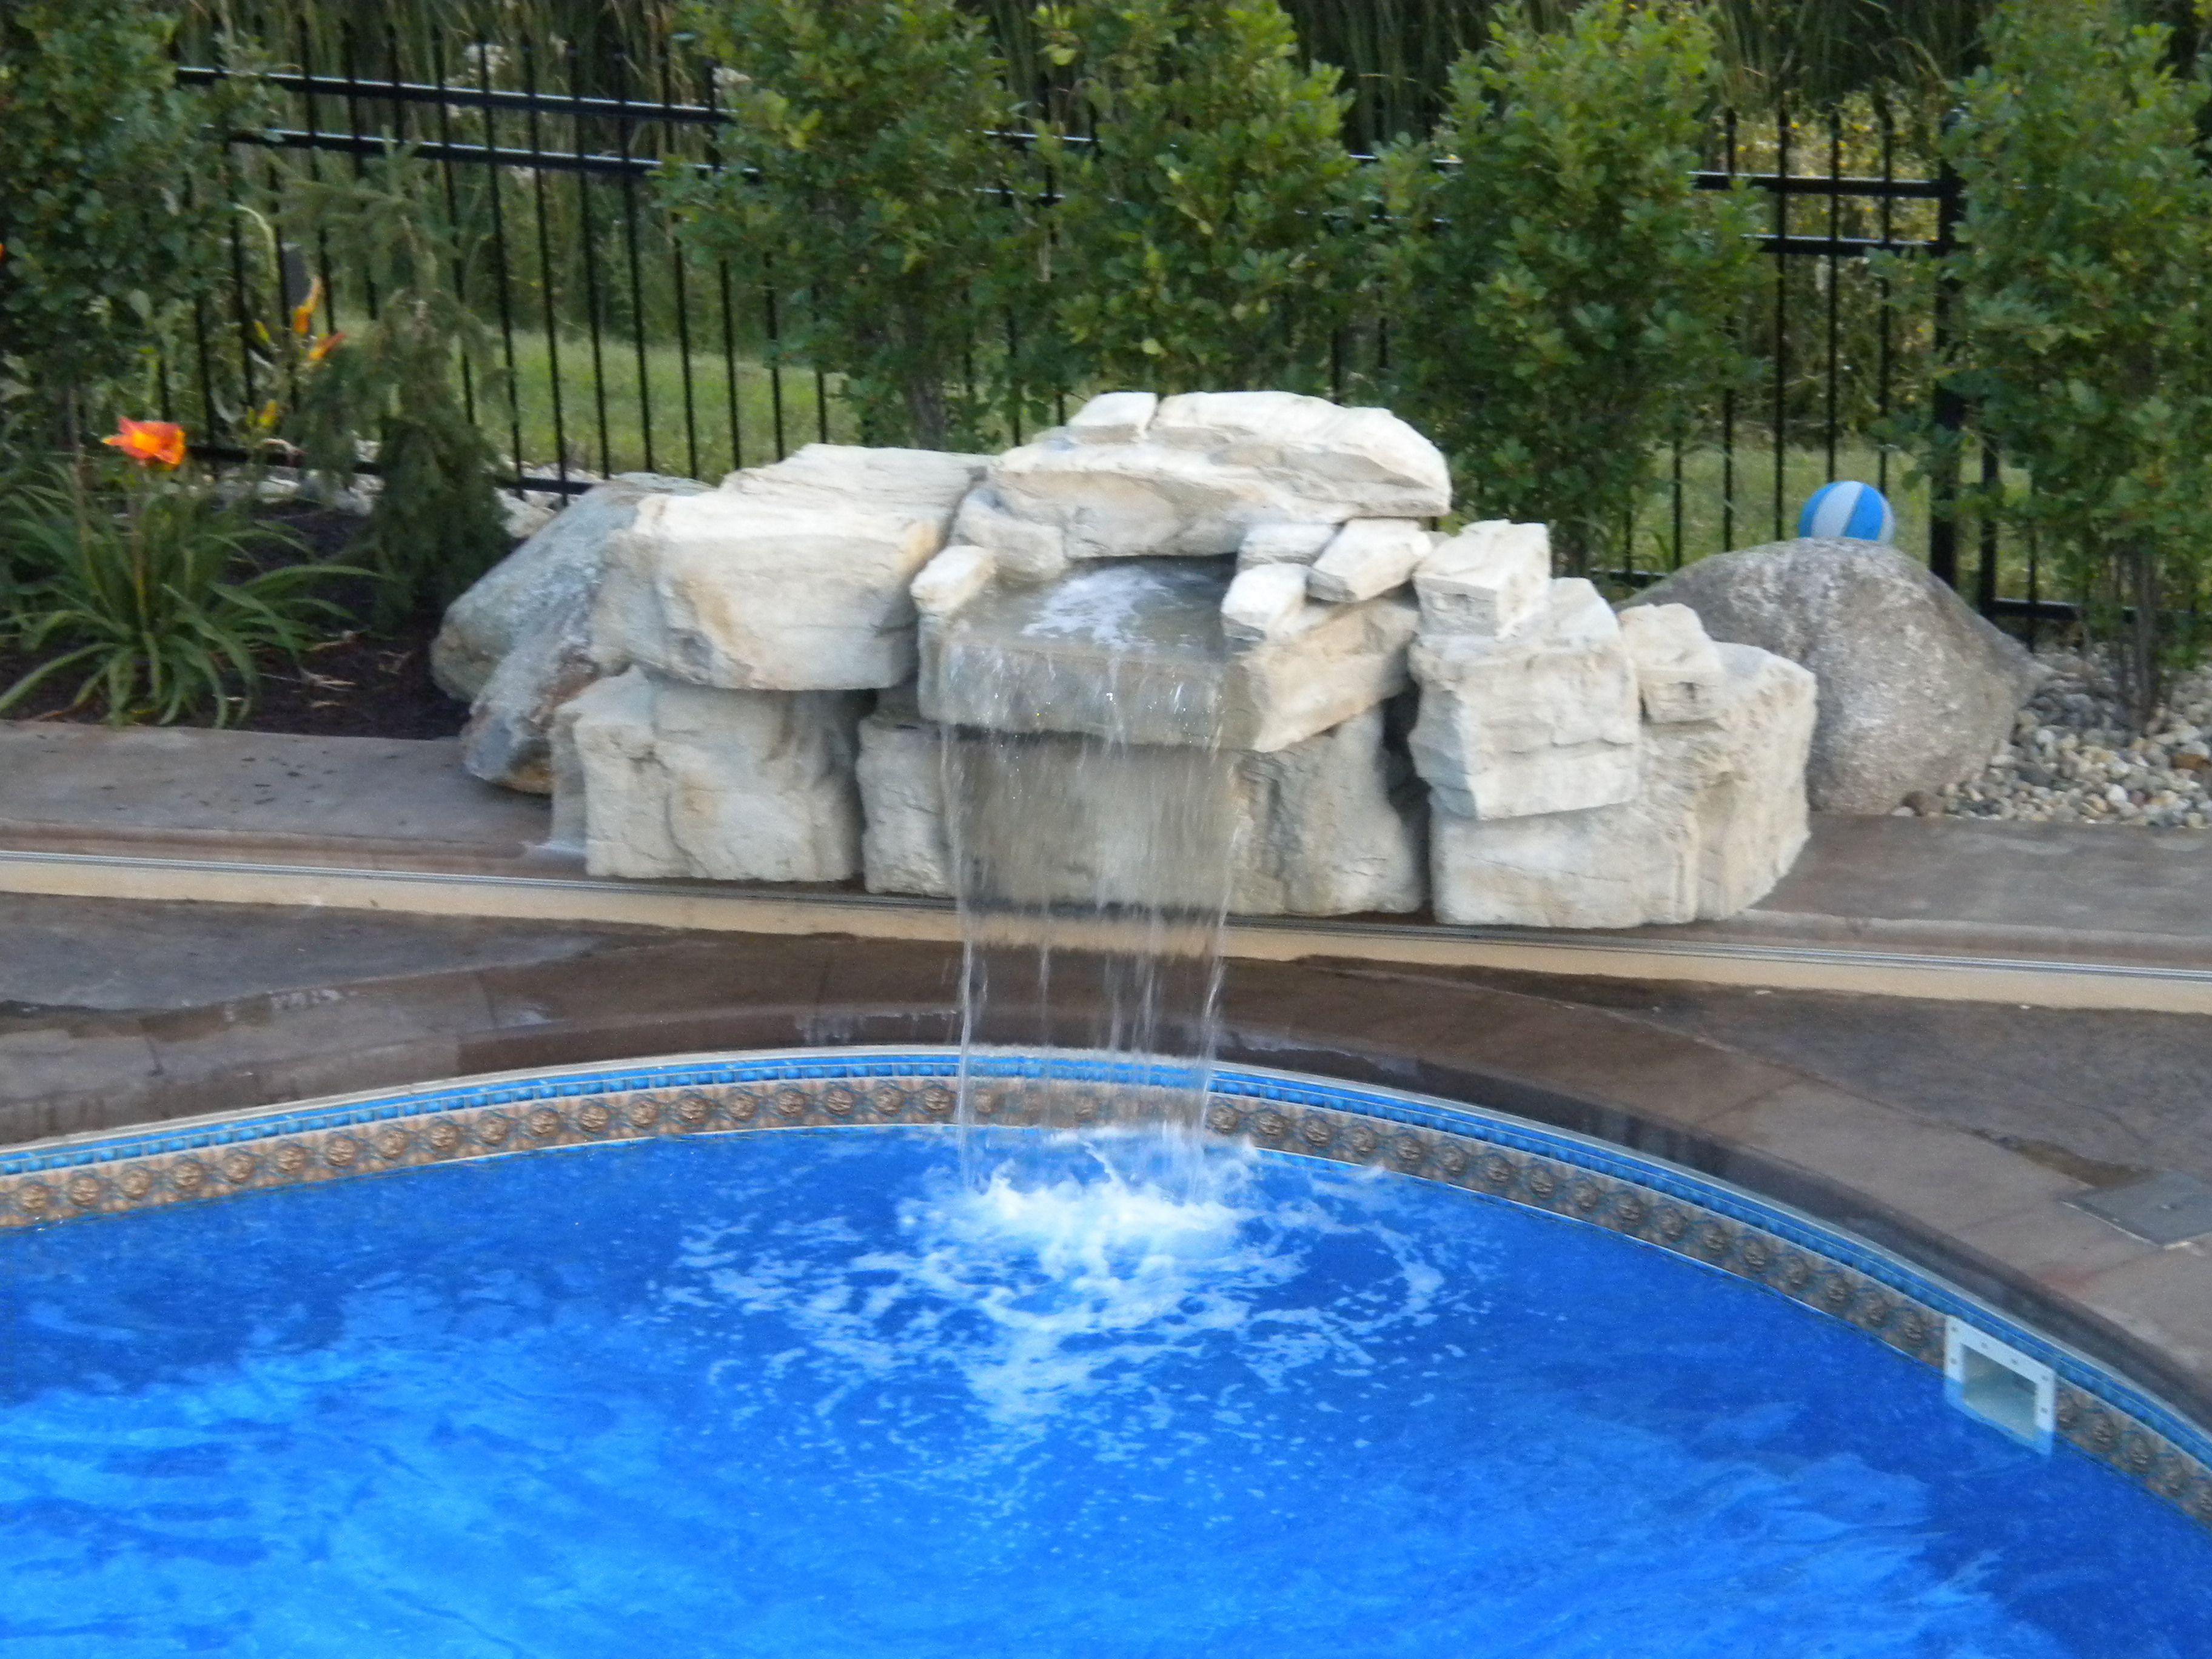 Mountain lake pool waterfall swimming pools by - Swimming pool waterfalls water features ...